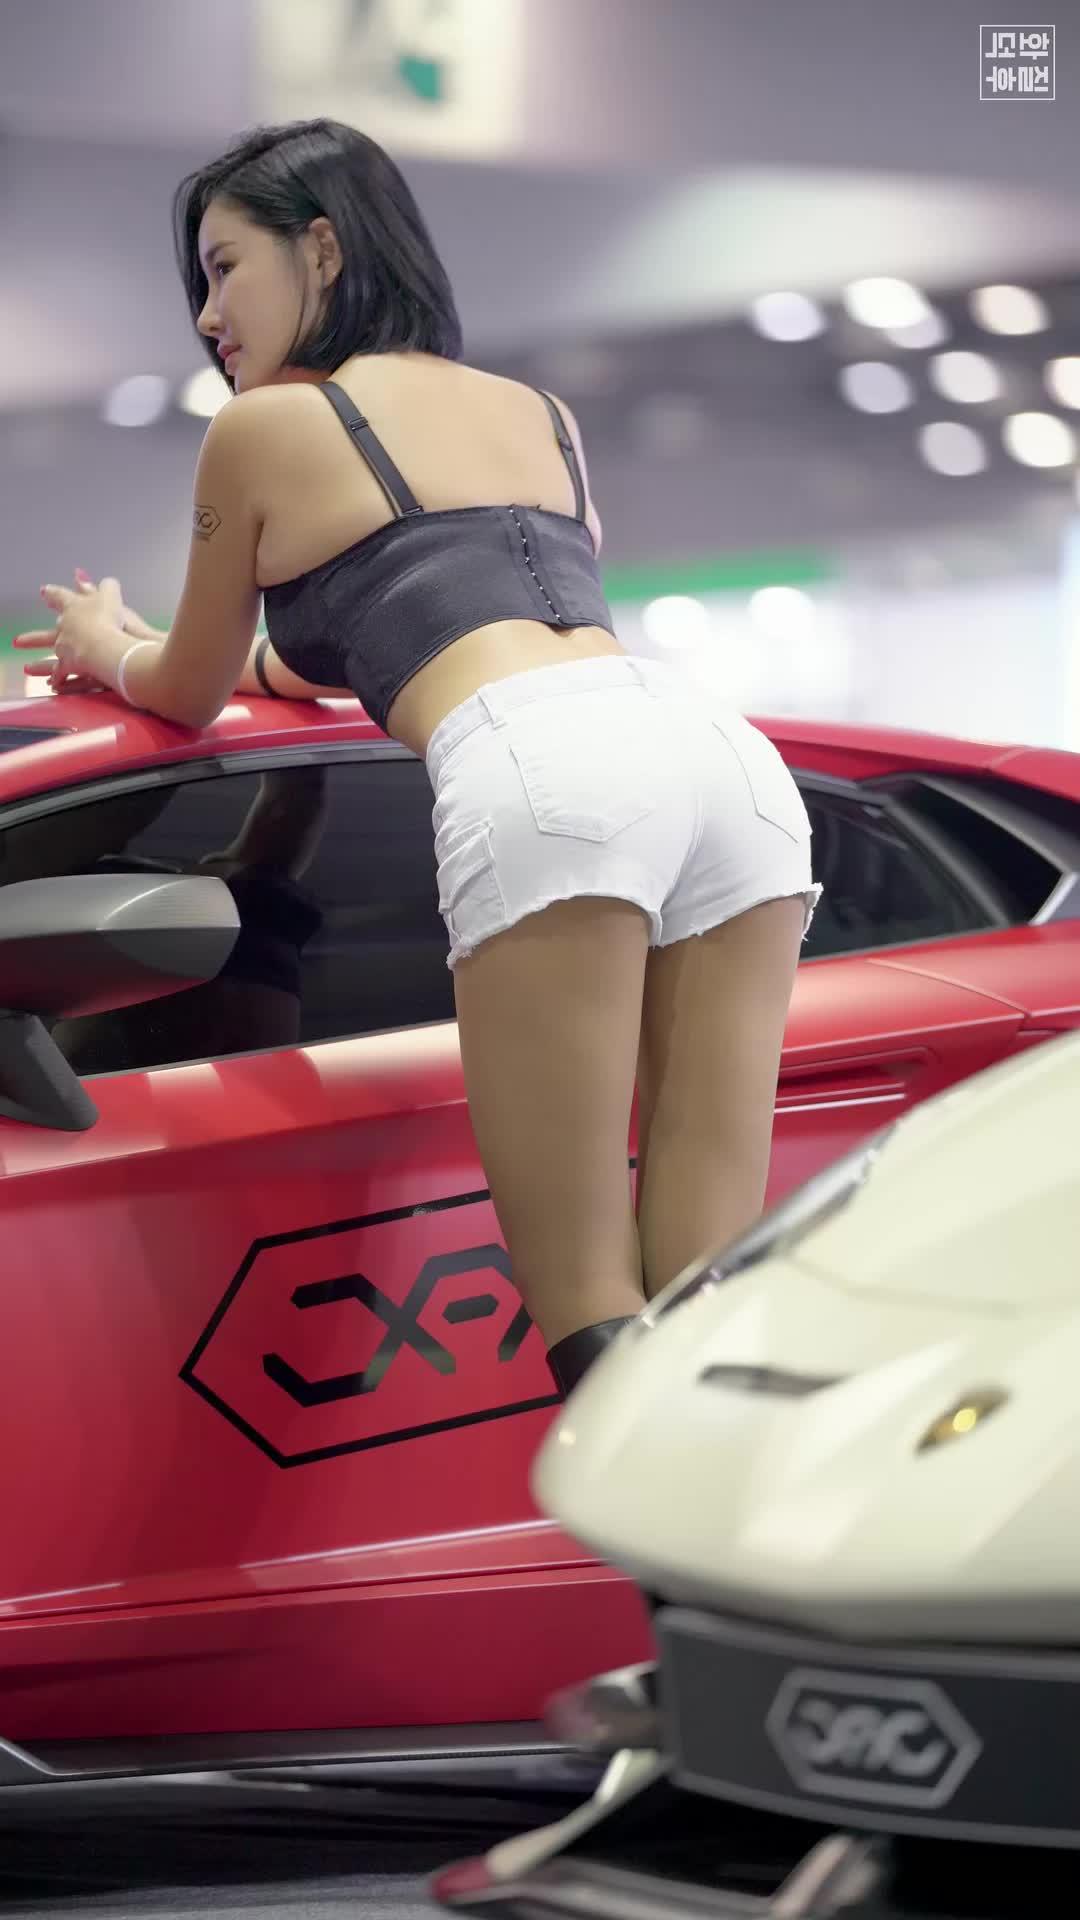 2019 Auto Salon Week - 천세라 Cheon Sera